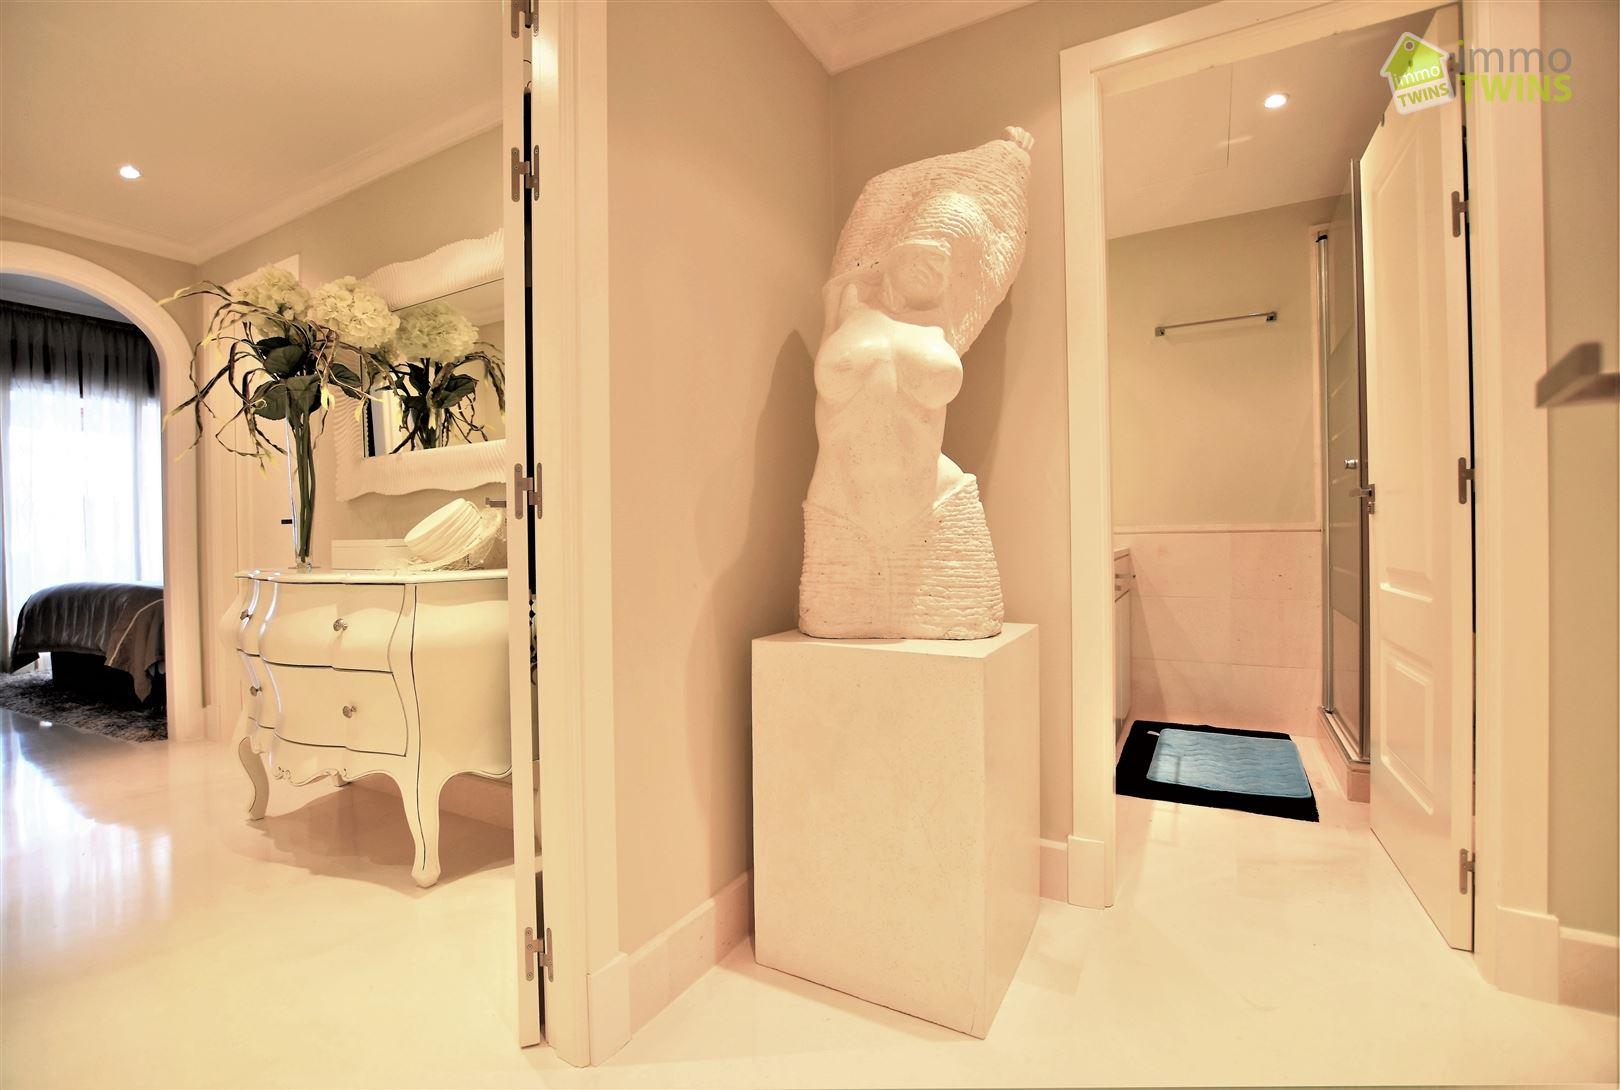 Foto 19 : Appartement te 29679 MARBELLA (Spanje) - Prijs € 485.000